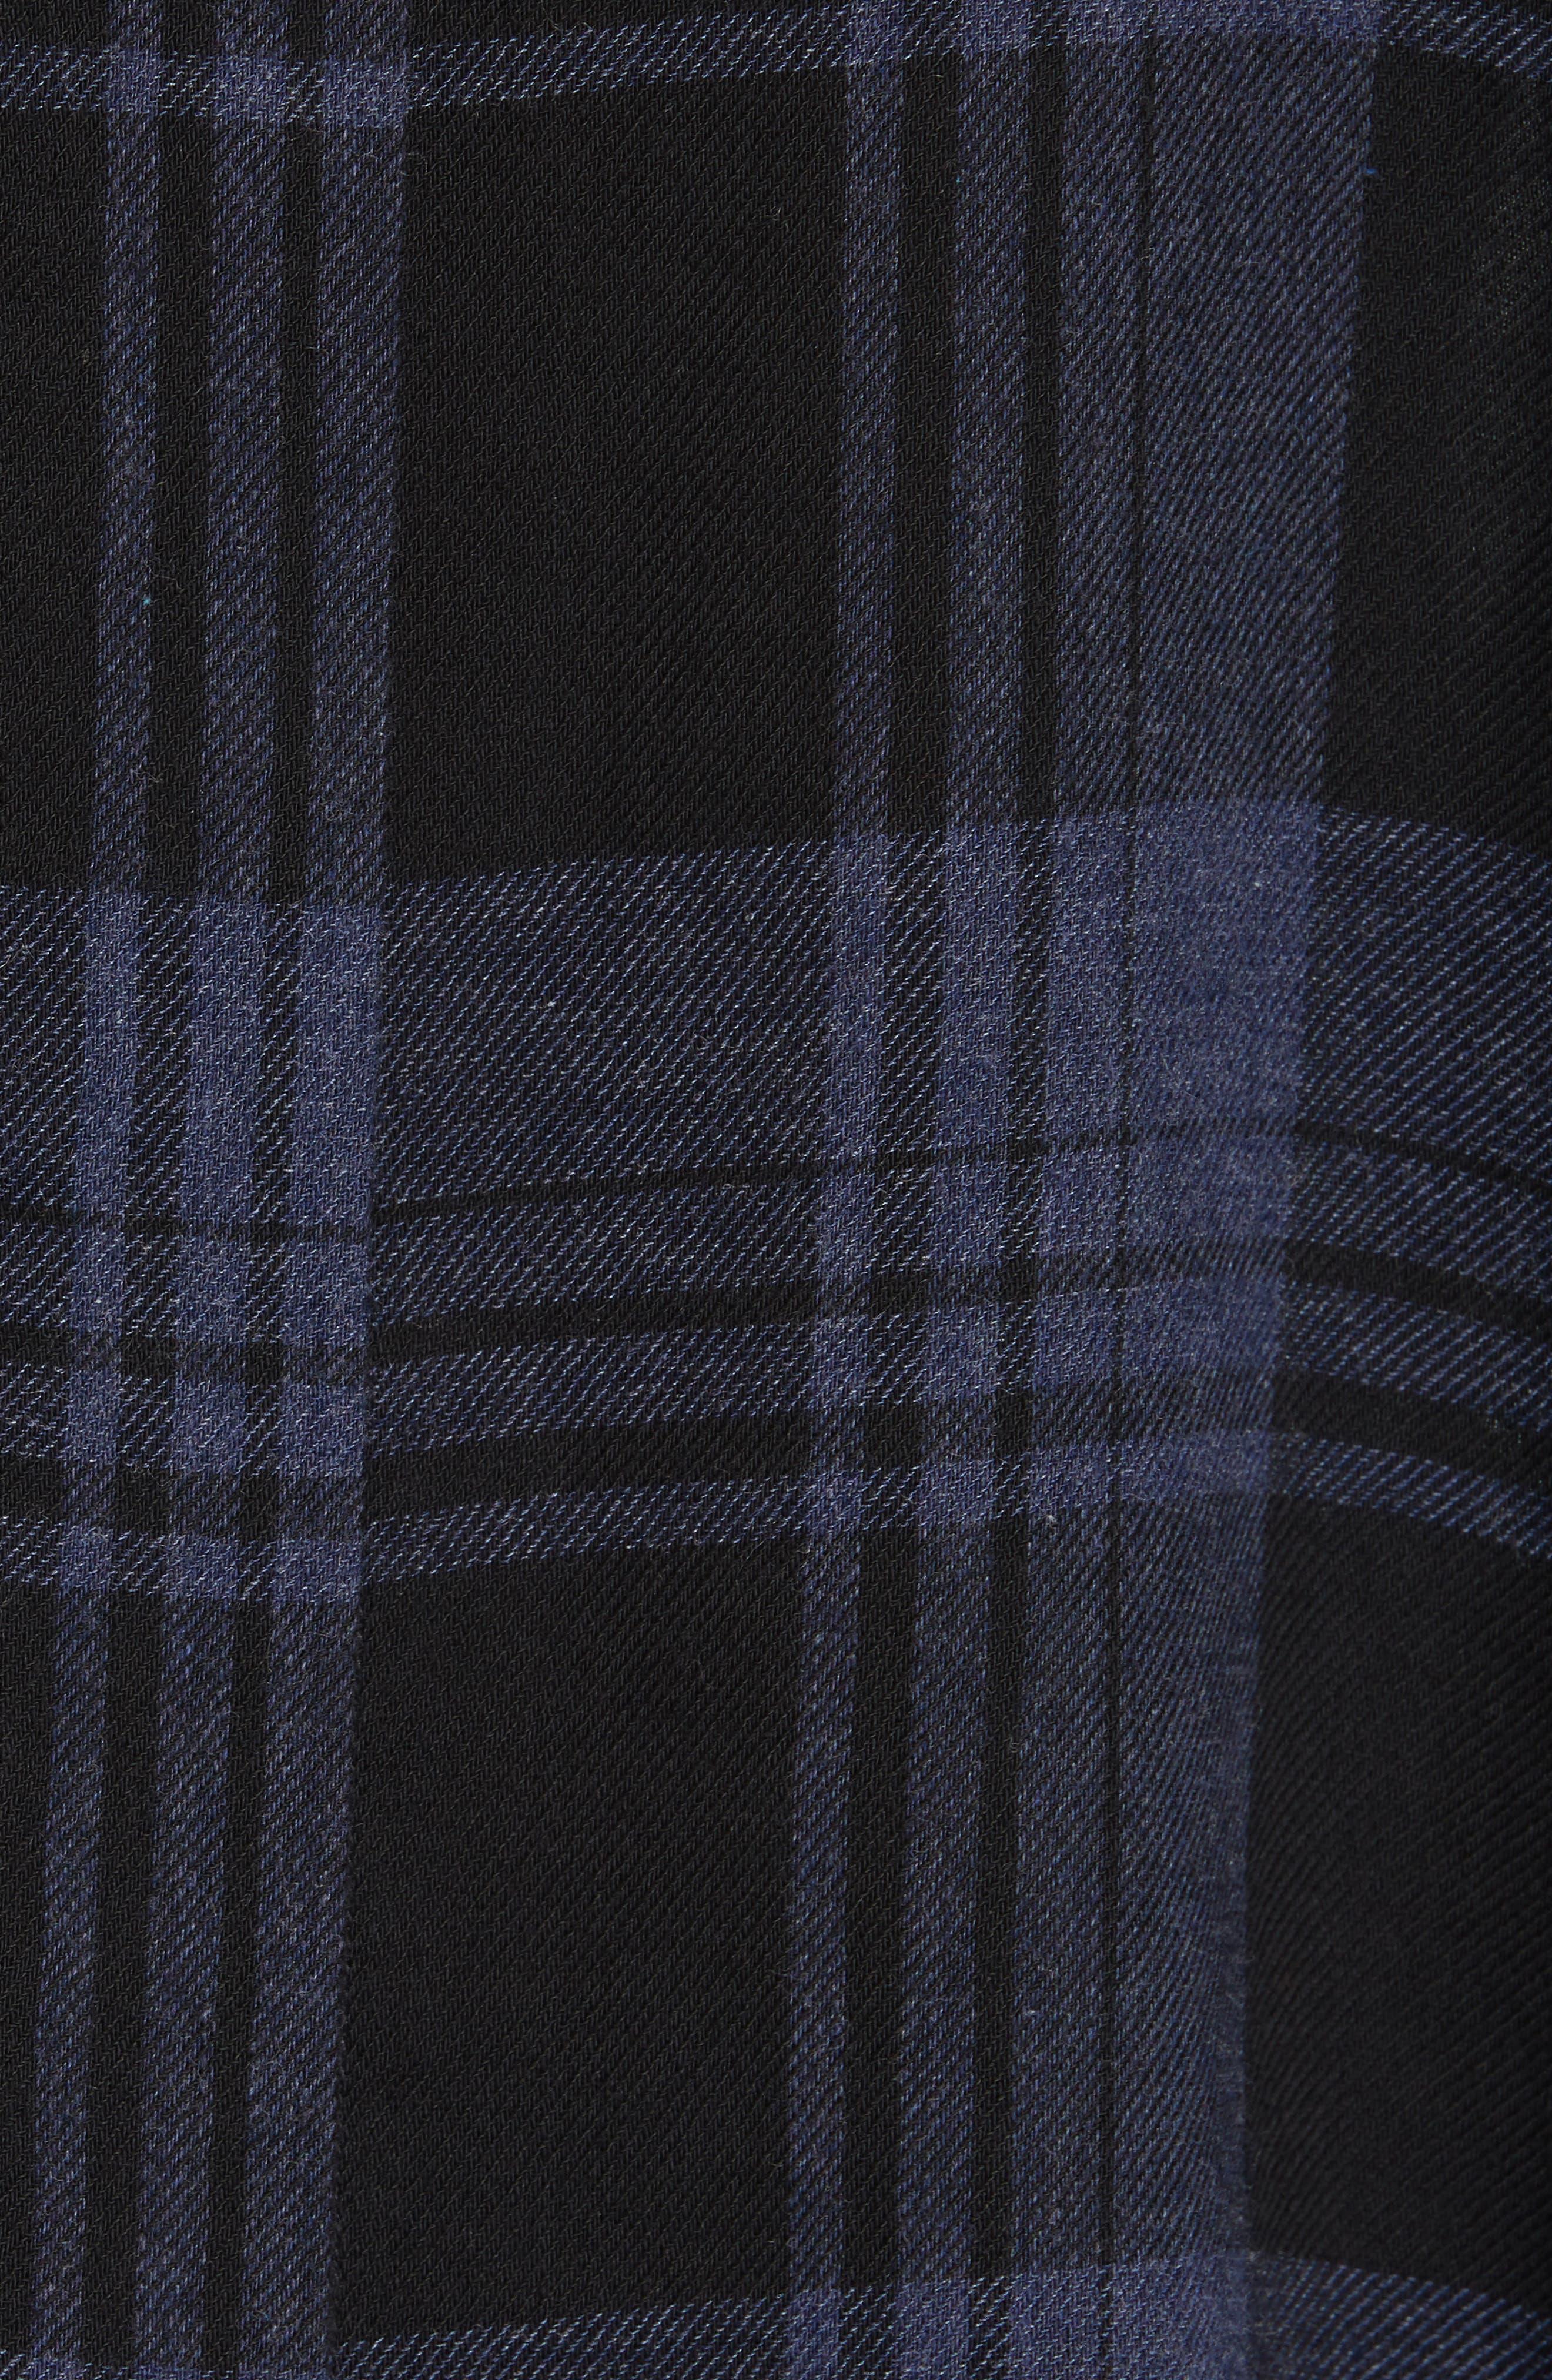 Heathered Plaid Top,                             Alternate thumbnail 5, color,                             BLACK